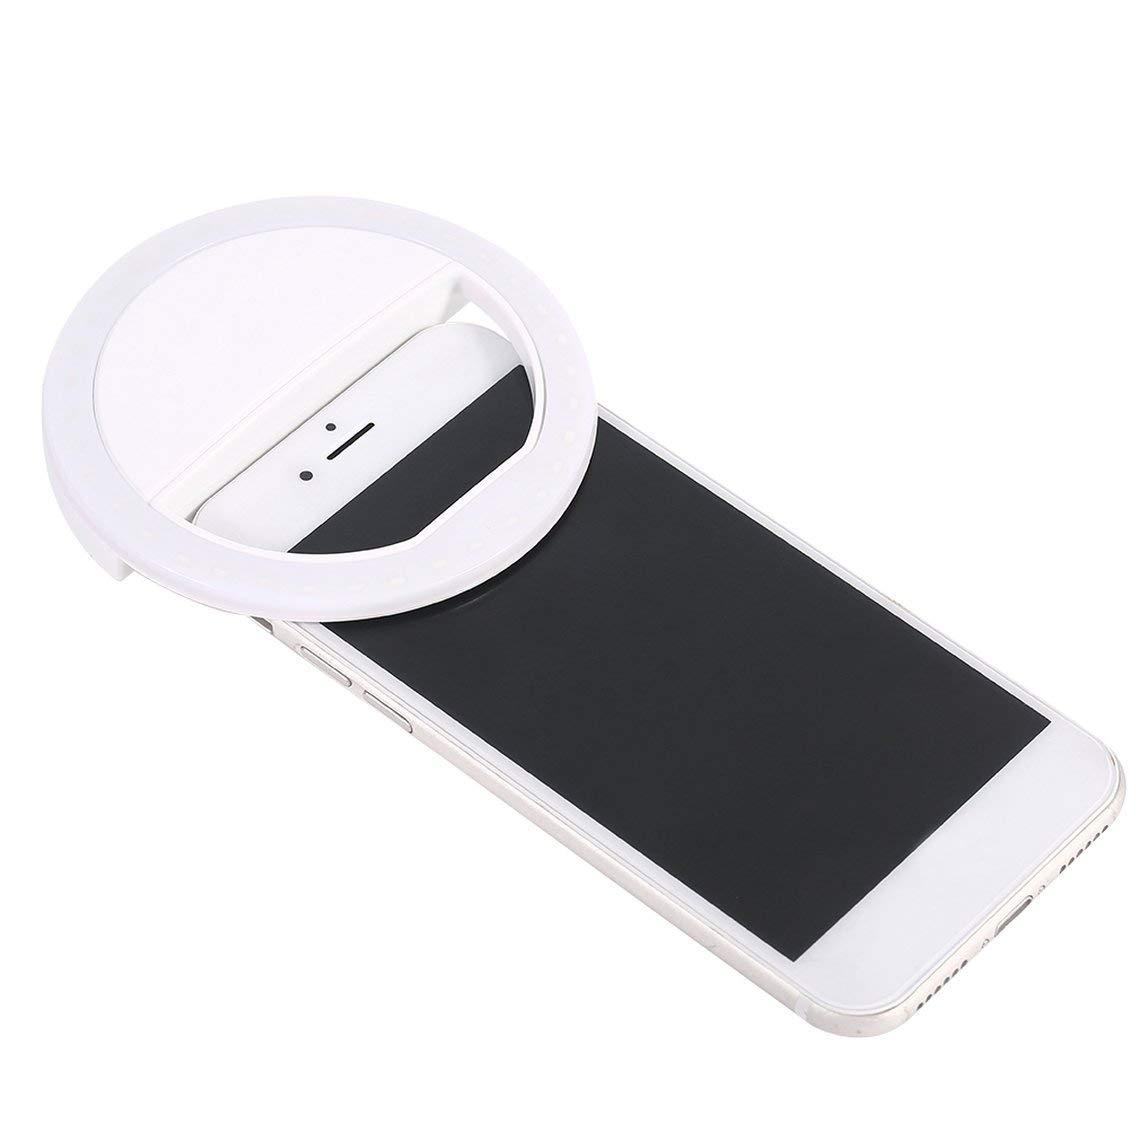 Zinniaya SG-11 Mini tel/éfono Recargable LED Selfie L/ámpara Anillo Luz port/átil Anillo Luz Mejora Fotograf/ía Noche Uso de la luz